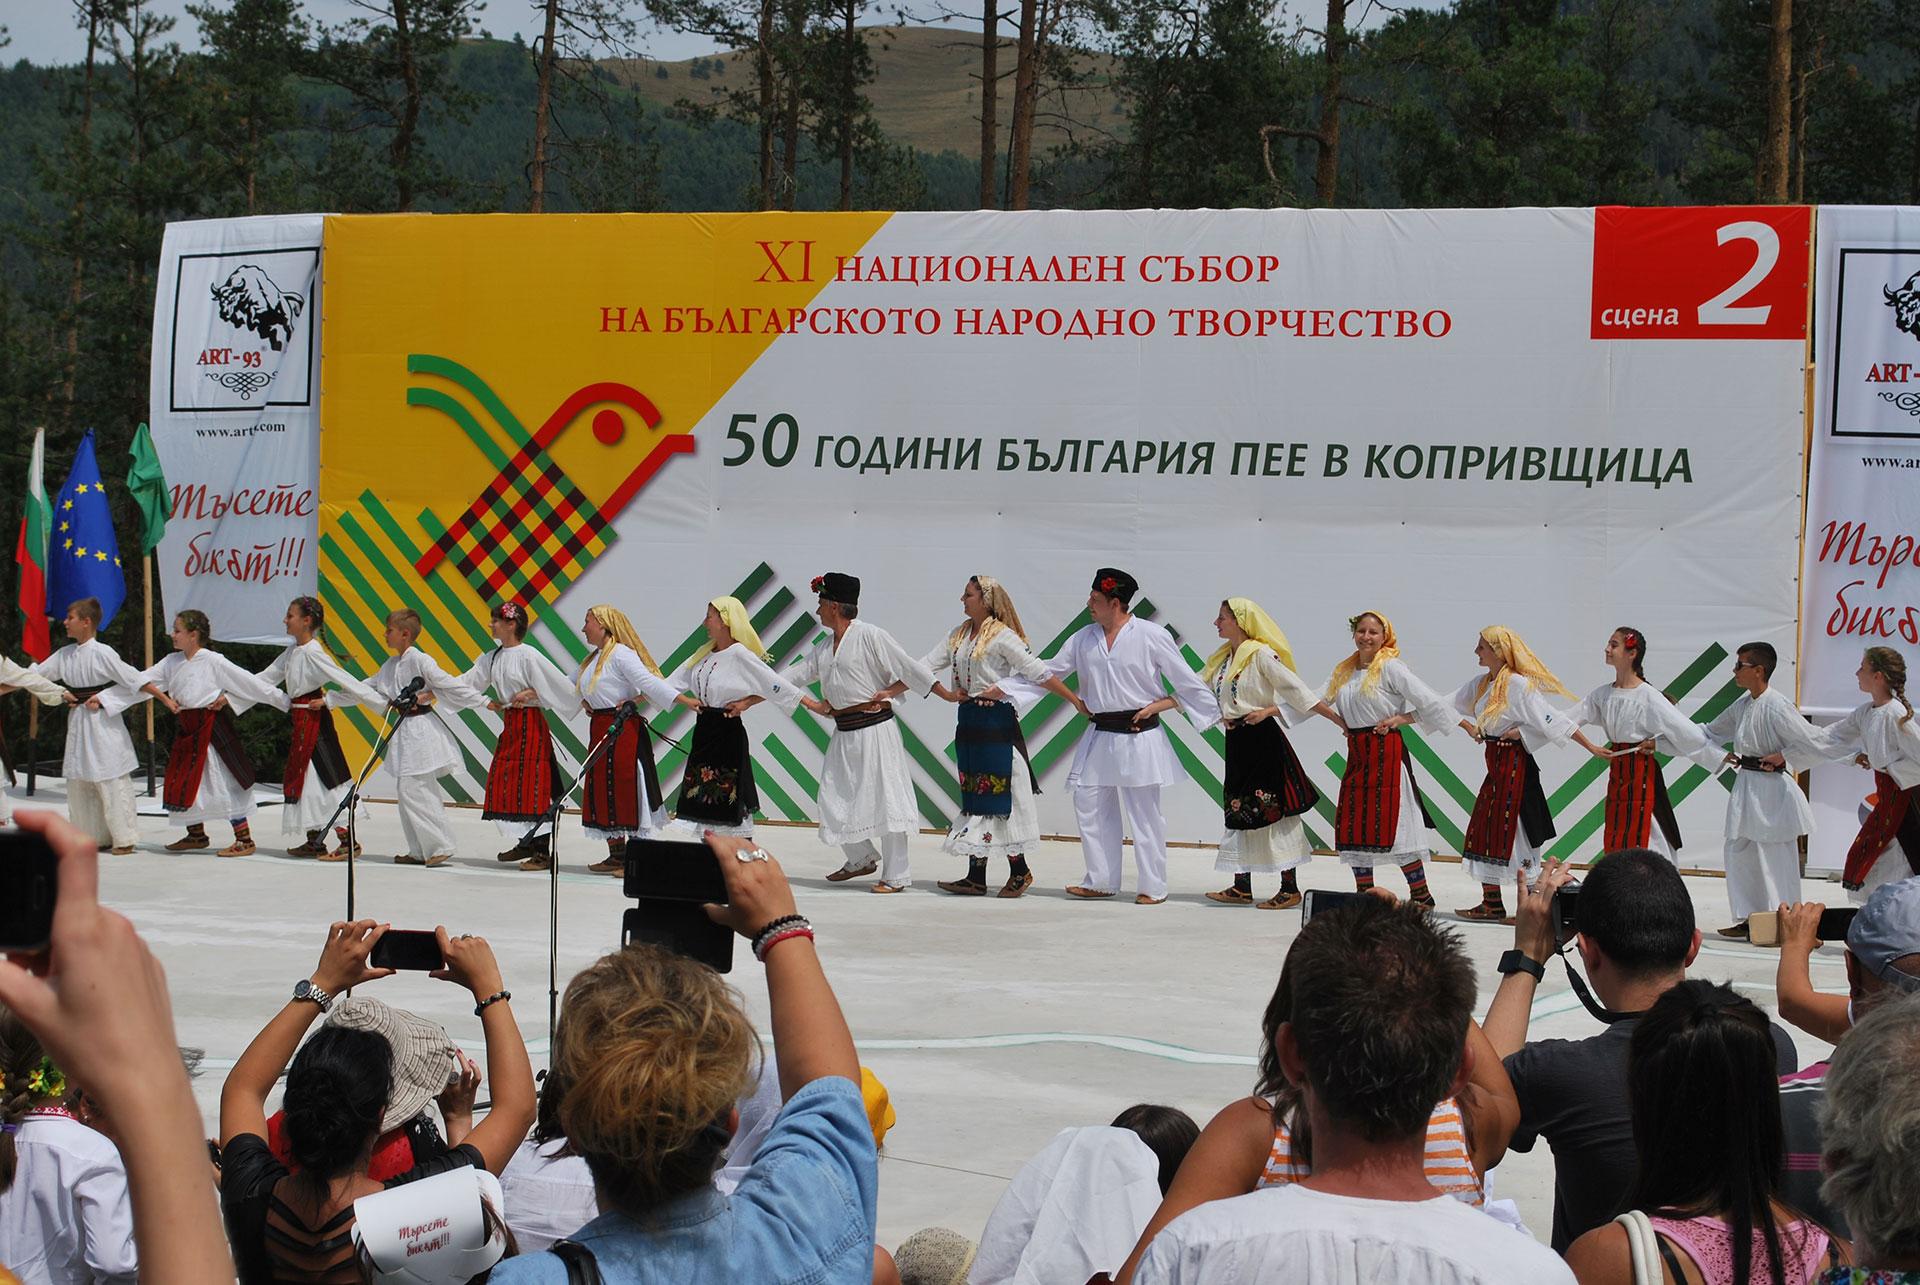 Koprivshtica-Festival_7353